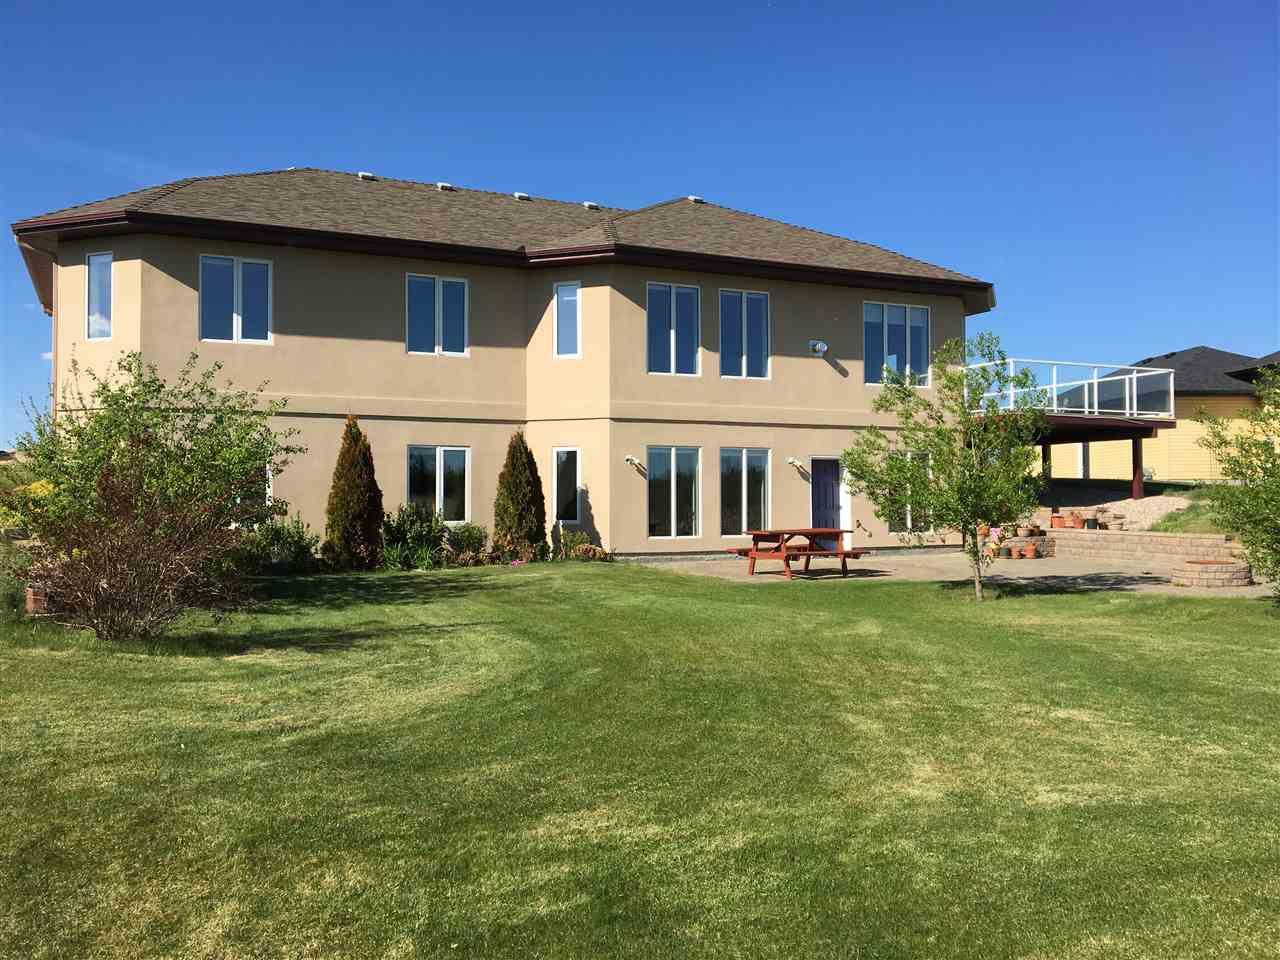 Main Photo: 133 53017 Range Road 223: Rural Strathcona County House for sale : MLS®# E4140713